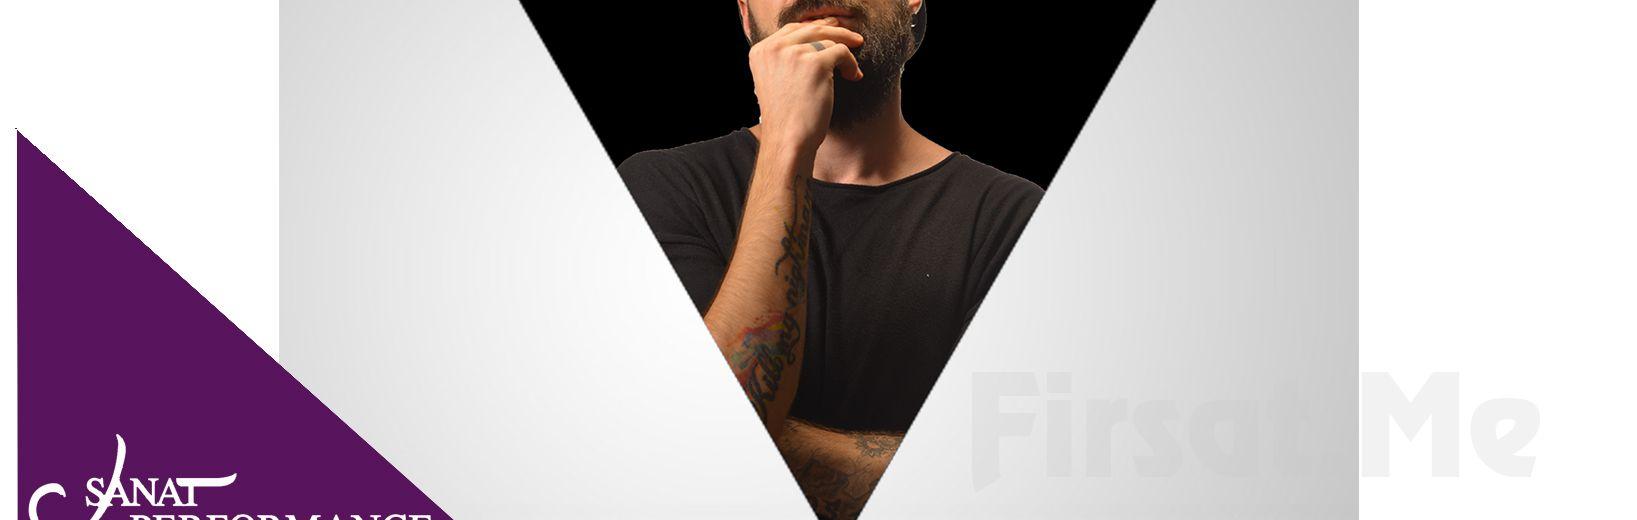 Beyoğlu Sanat Performance'ta 17 Ekim'de Zeo Jaweed Konser Bileti